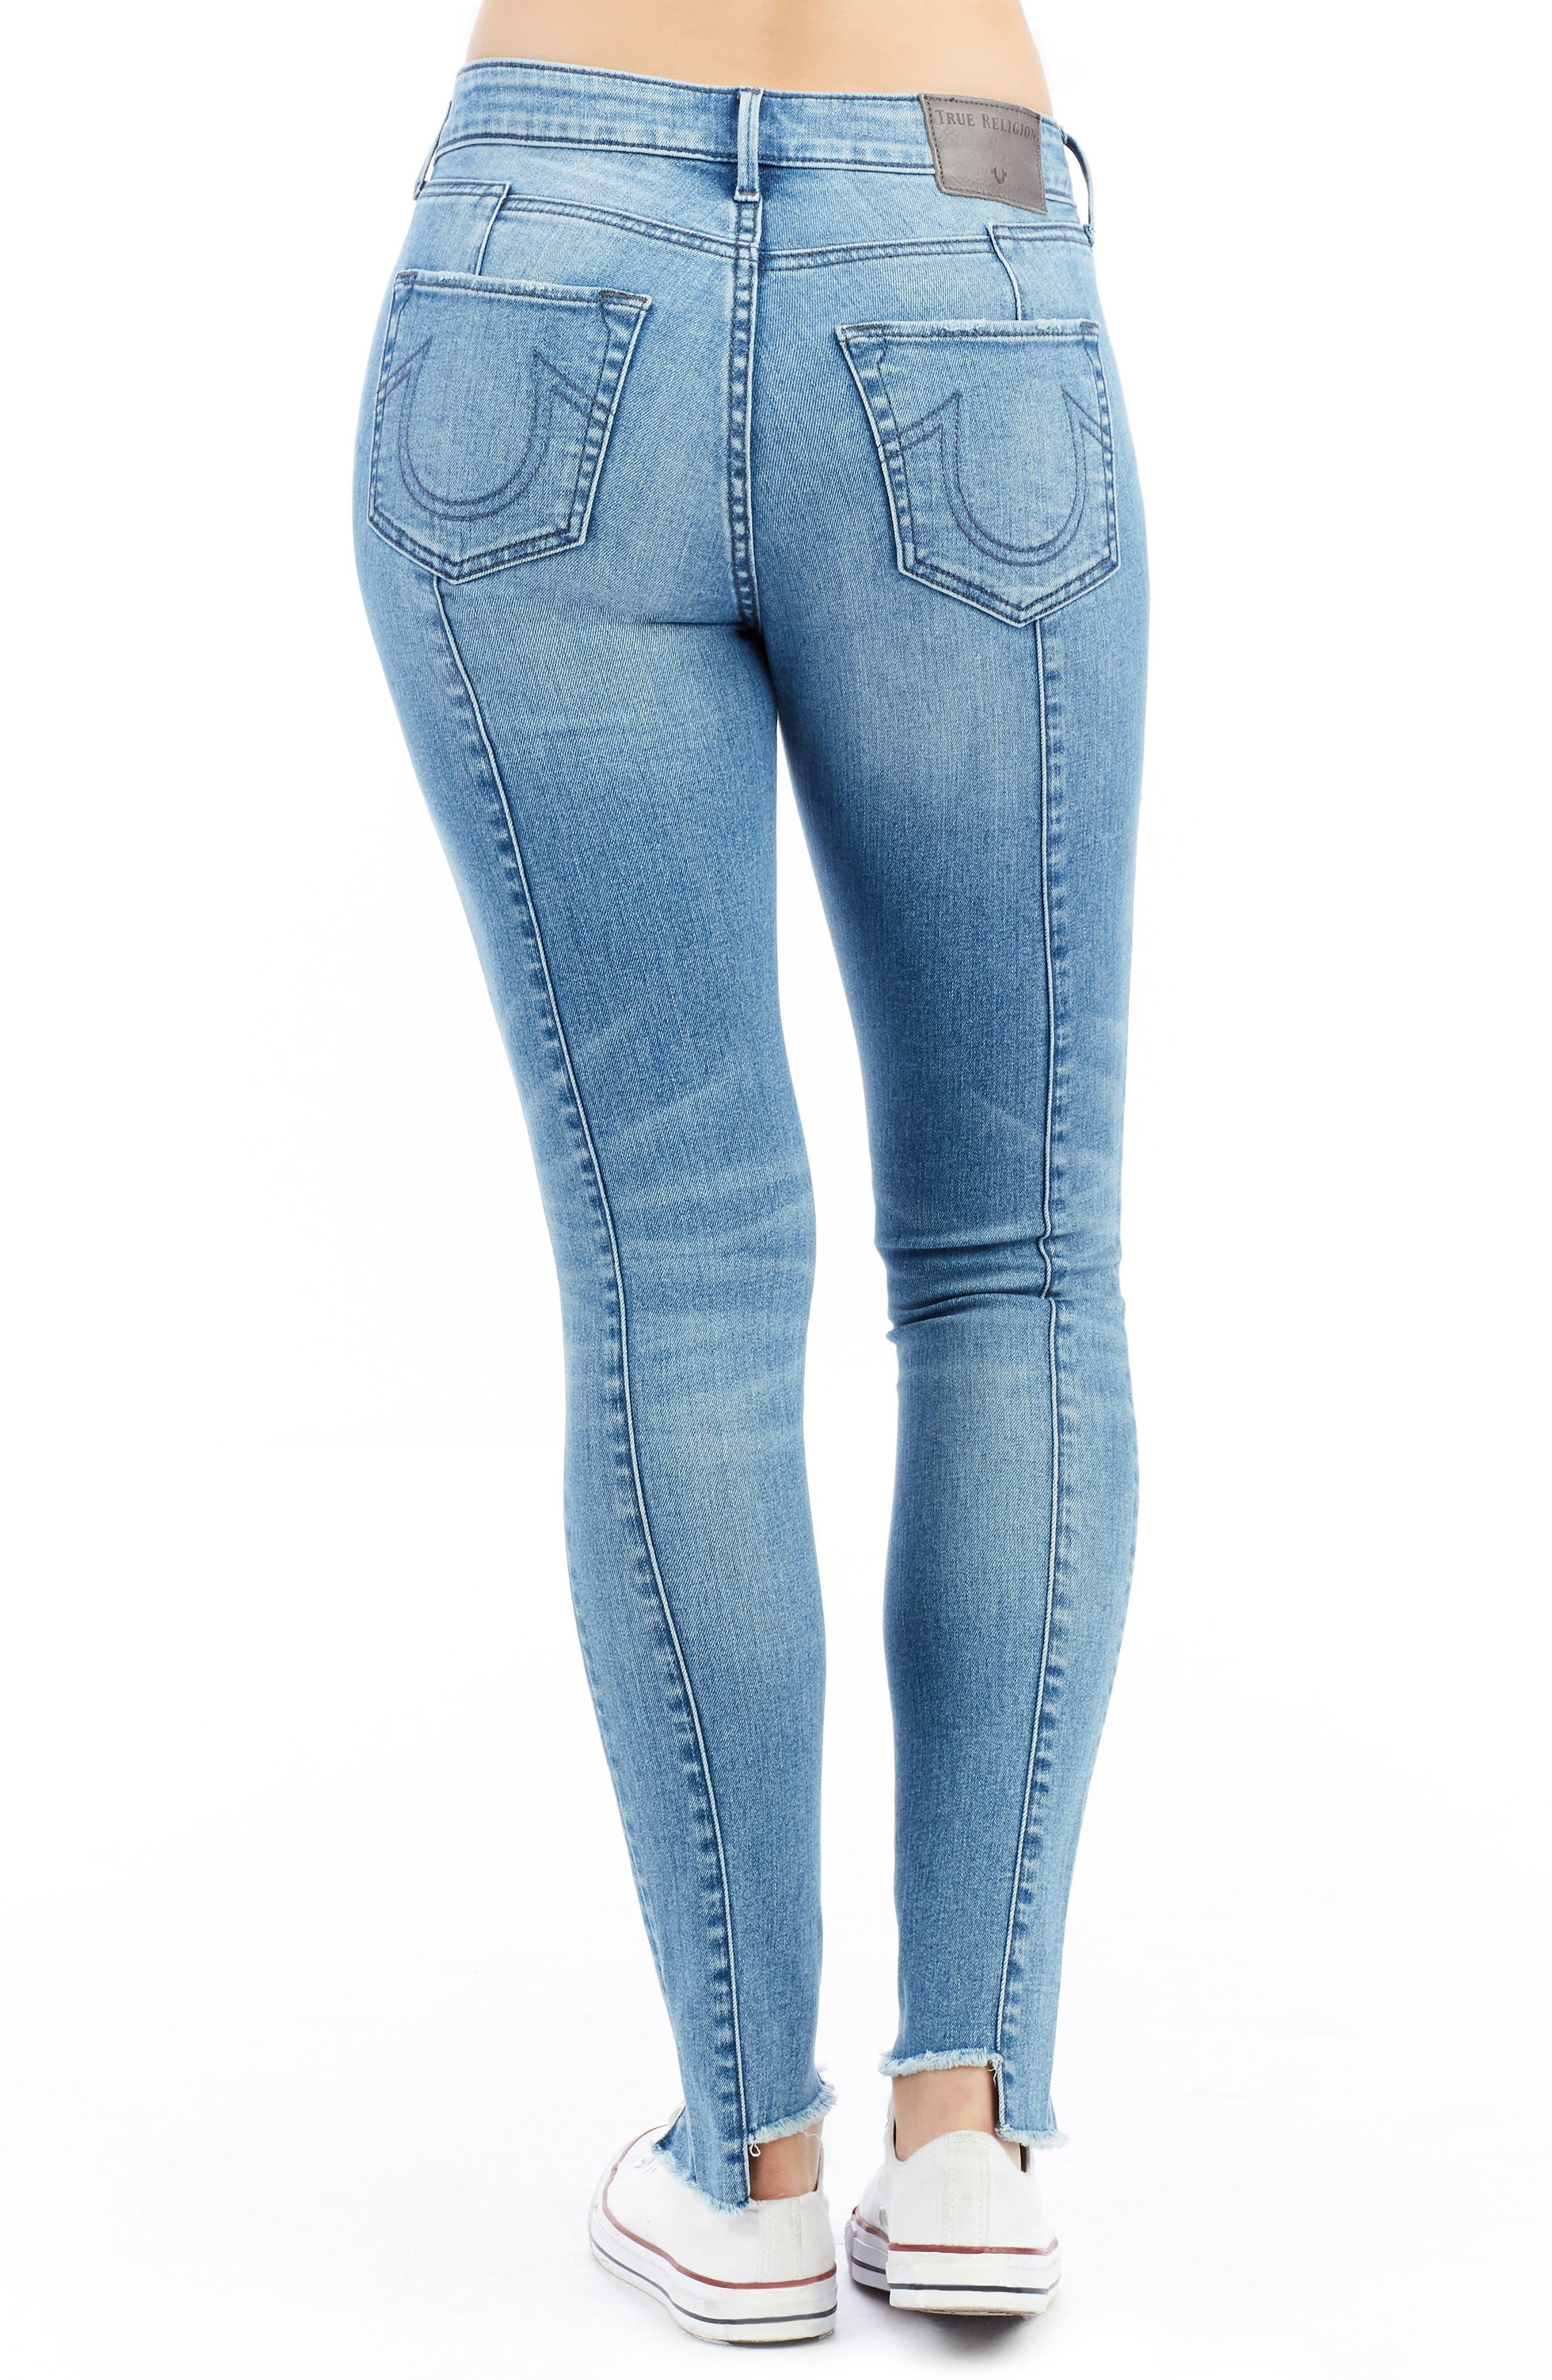 Jennie Curvy Ankle Skinny Jeans,                             Alternate thumbnail 2, color,                             401